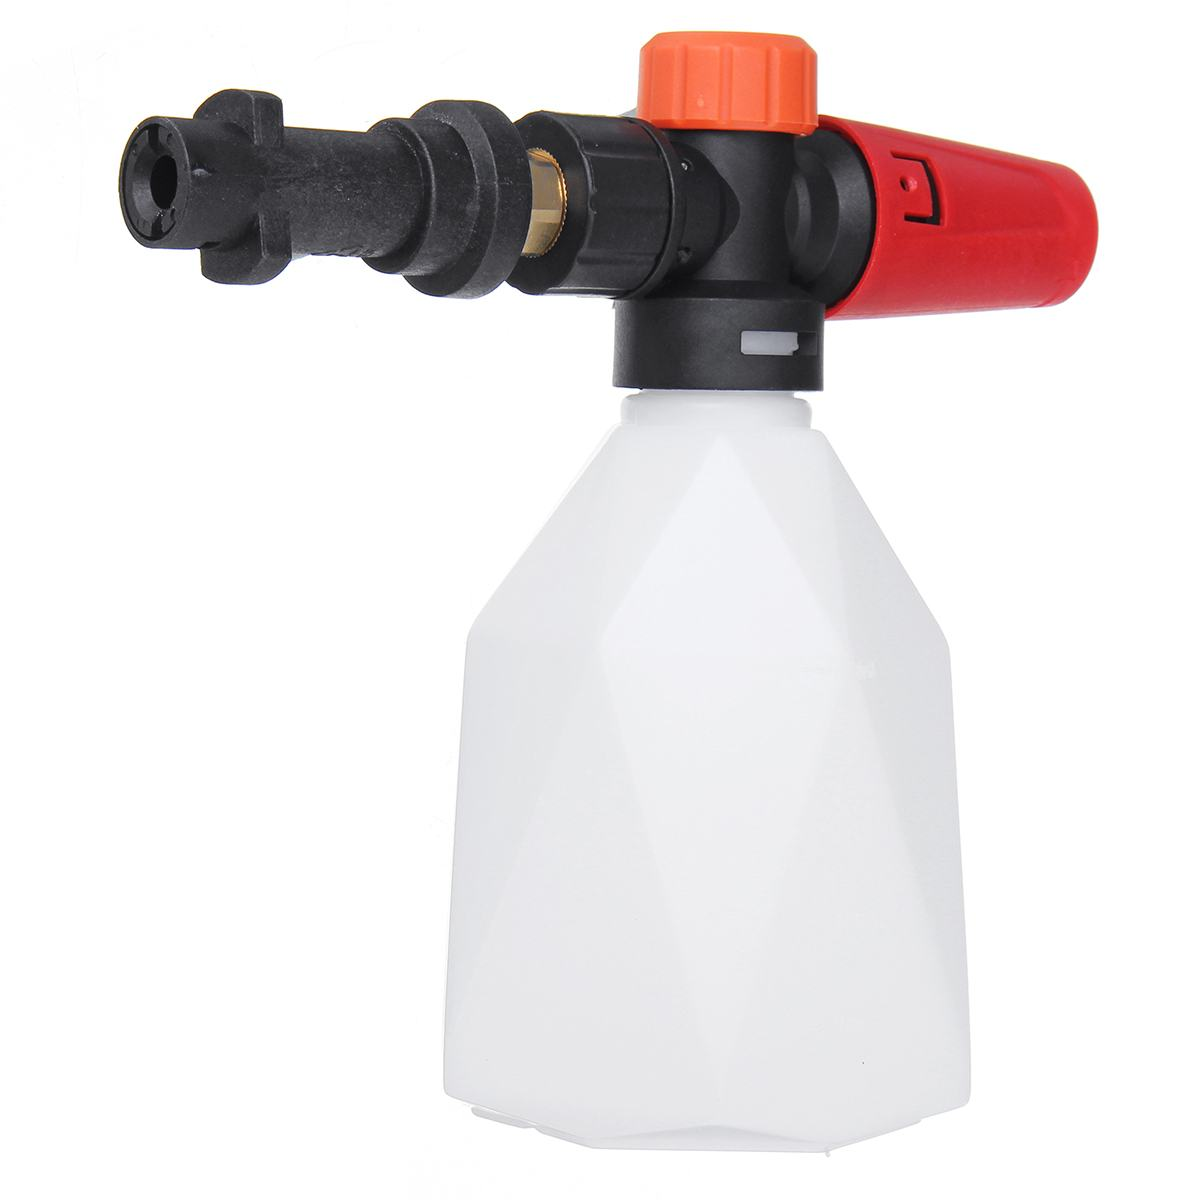 Car Foam Wash  Lance Foam Nozzle Cannon Generator For Daewoo Hammer Huter Makita High Pressure Washer